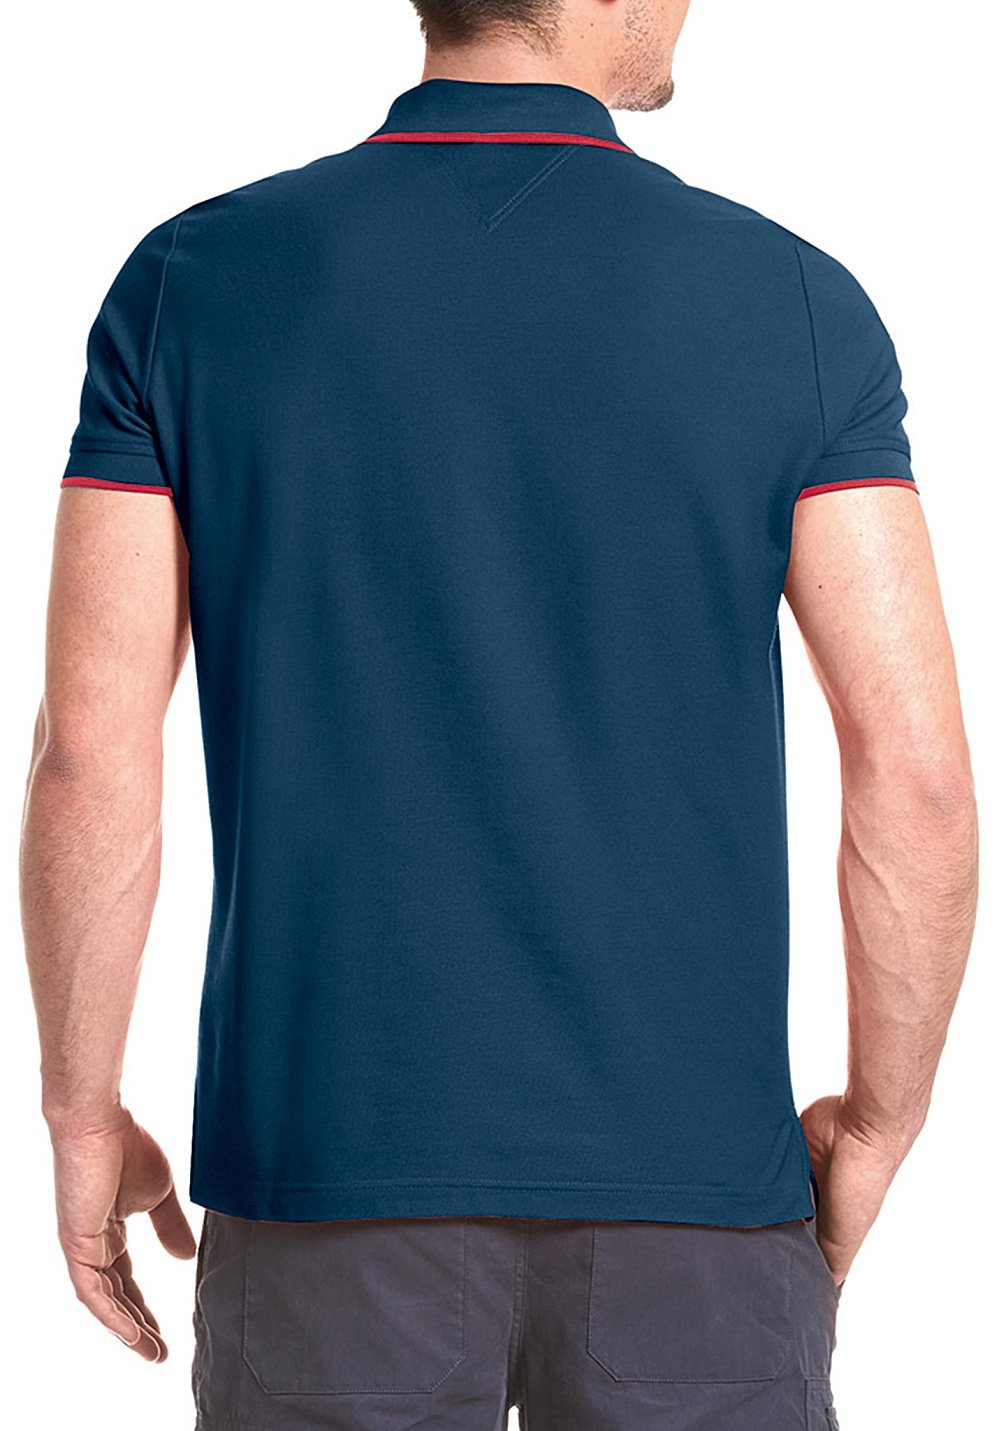 Maier Sports Hr. Comfort Polo M Polo Shirt 152615-368